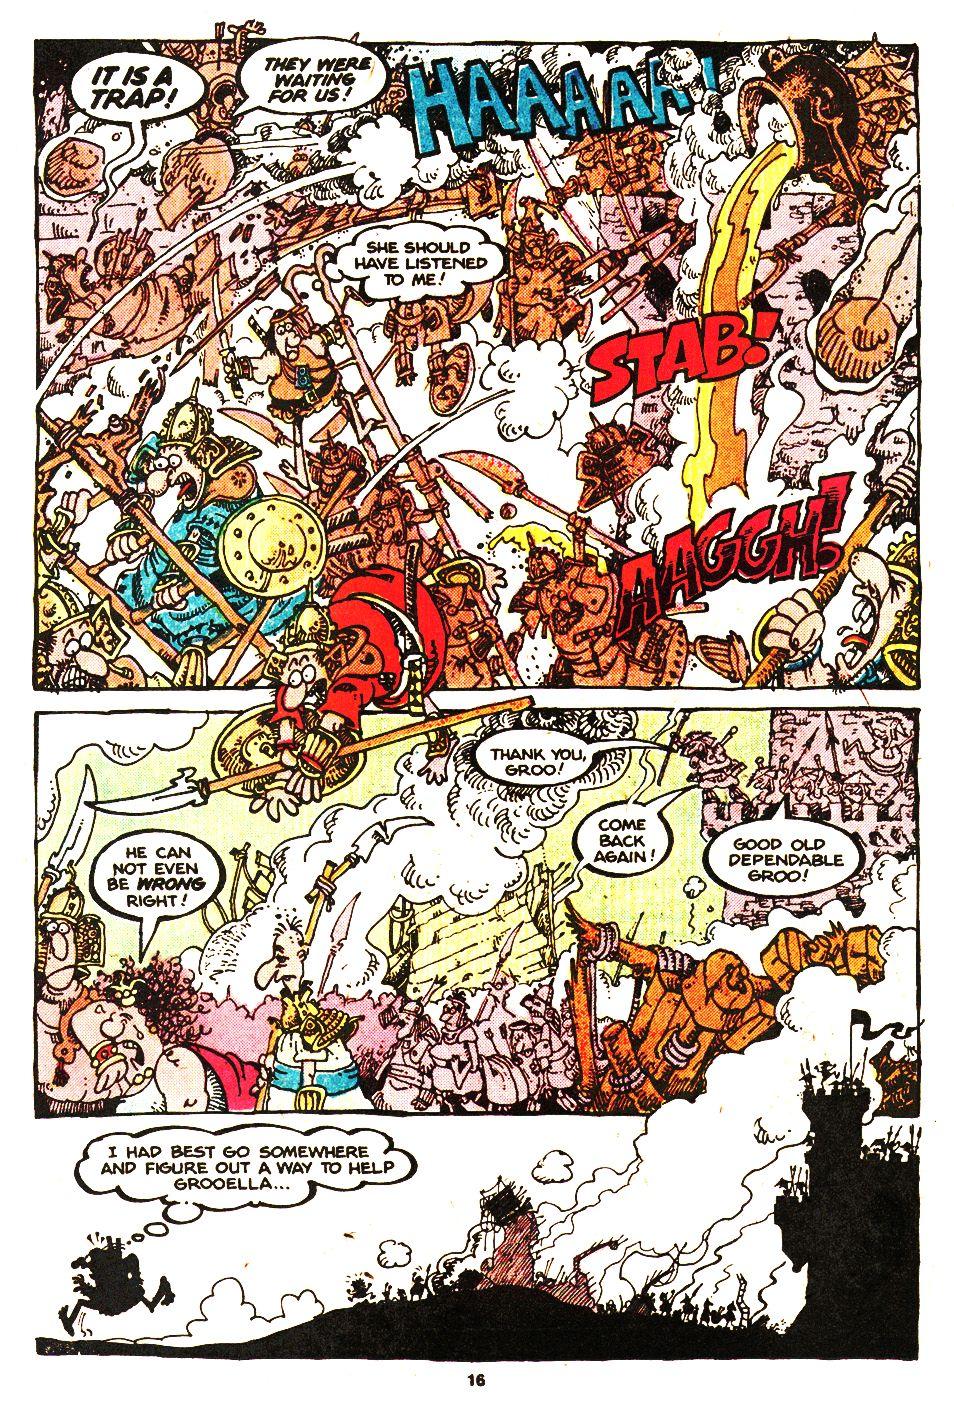 Read online Sergio Aragonés Groo the Wanderer comic -  Issue #20 - 16